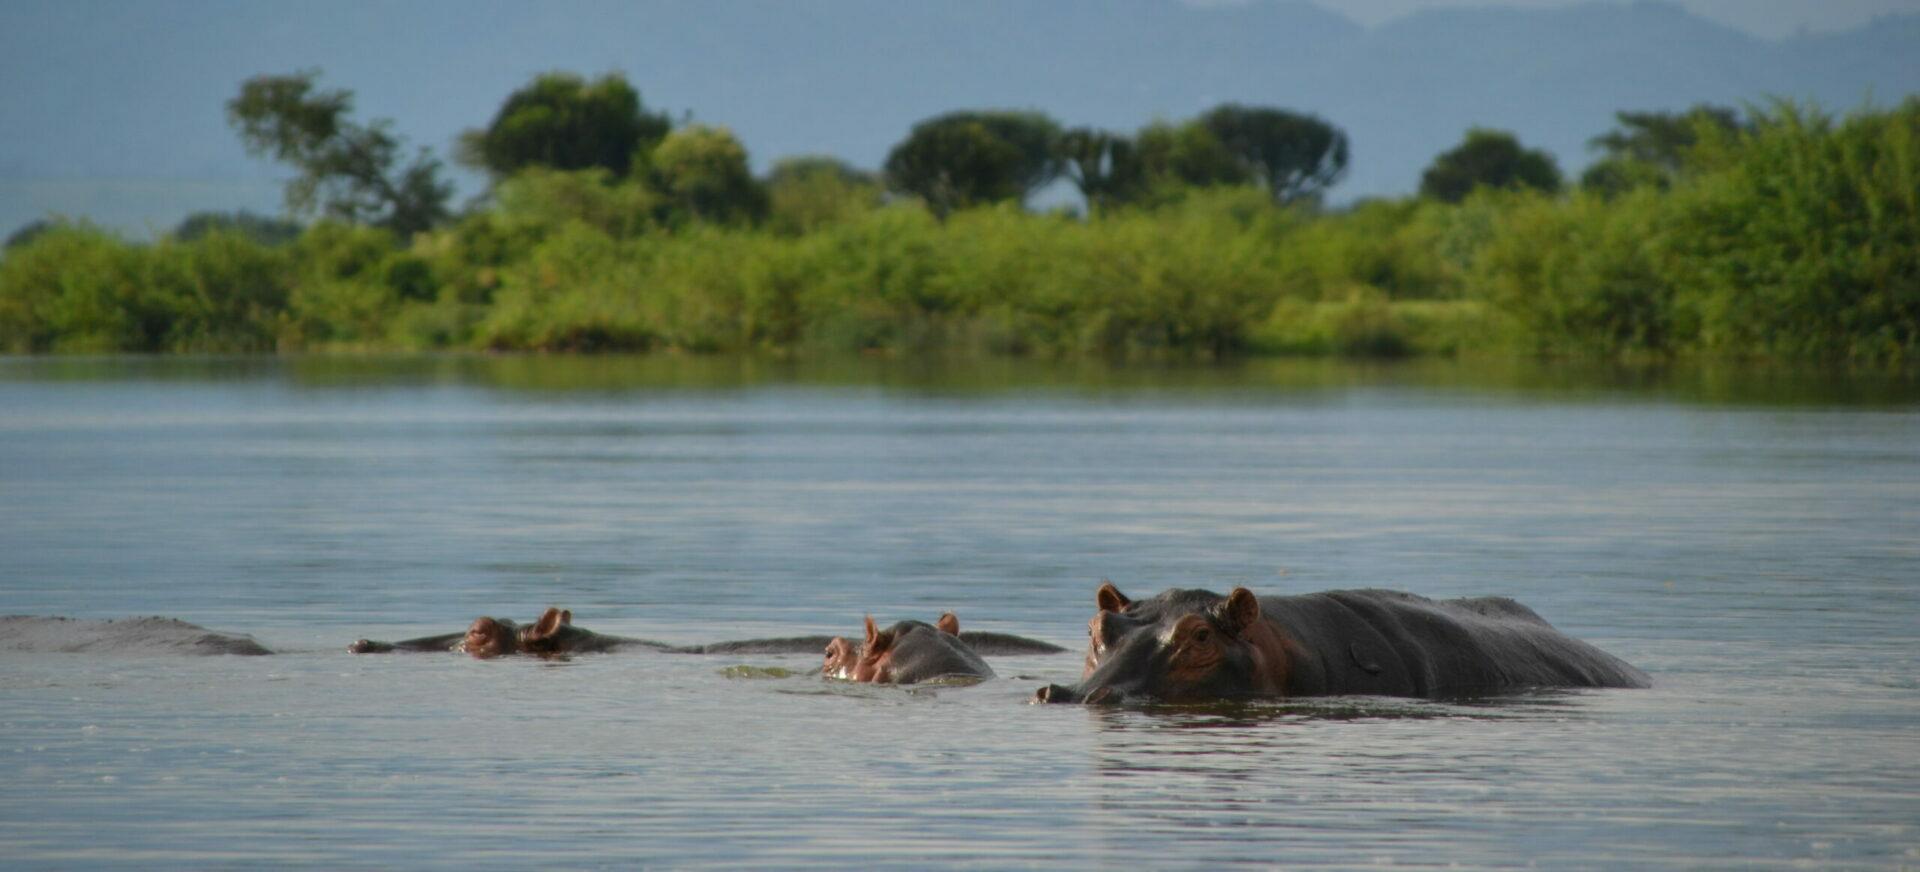 watch hippos at the lake